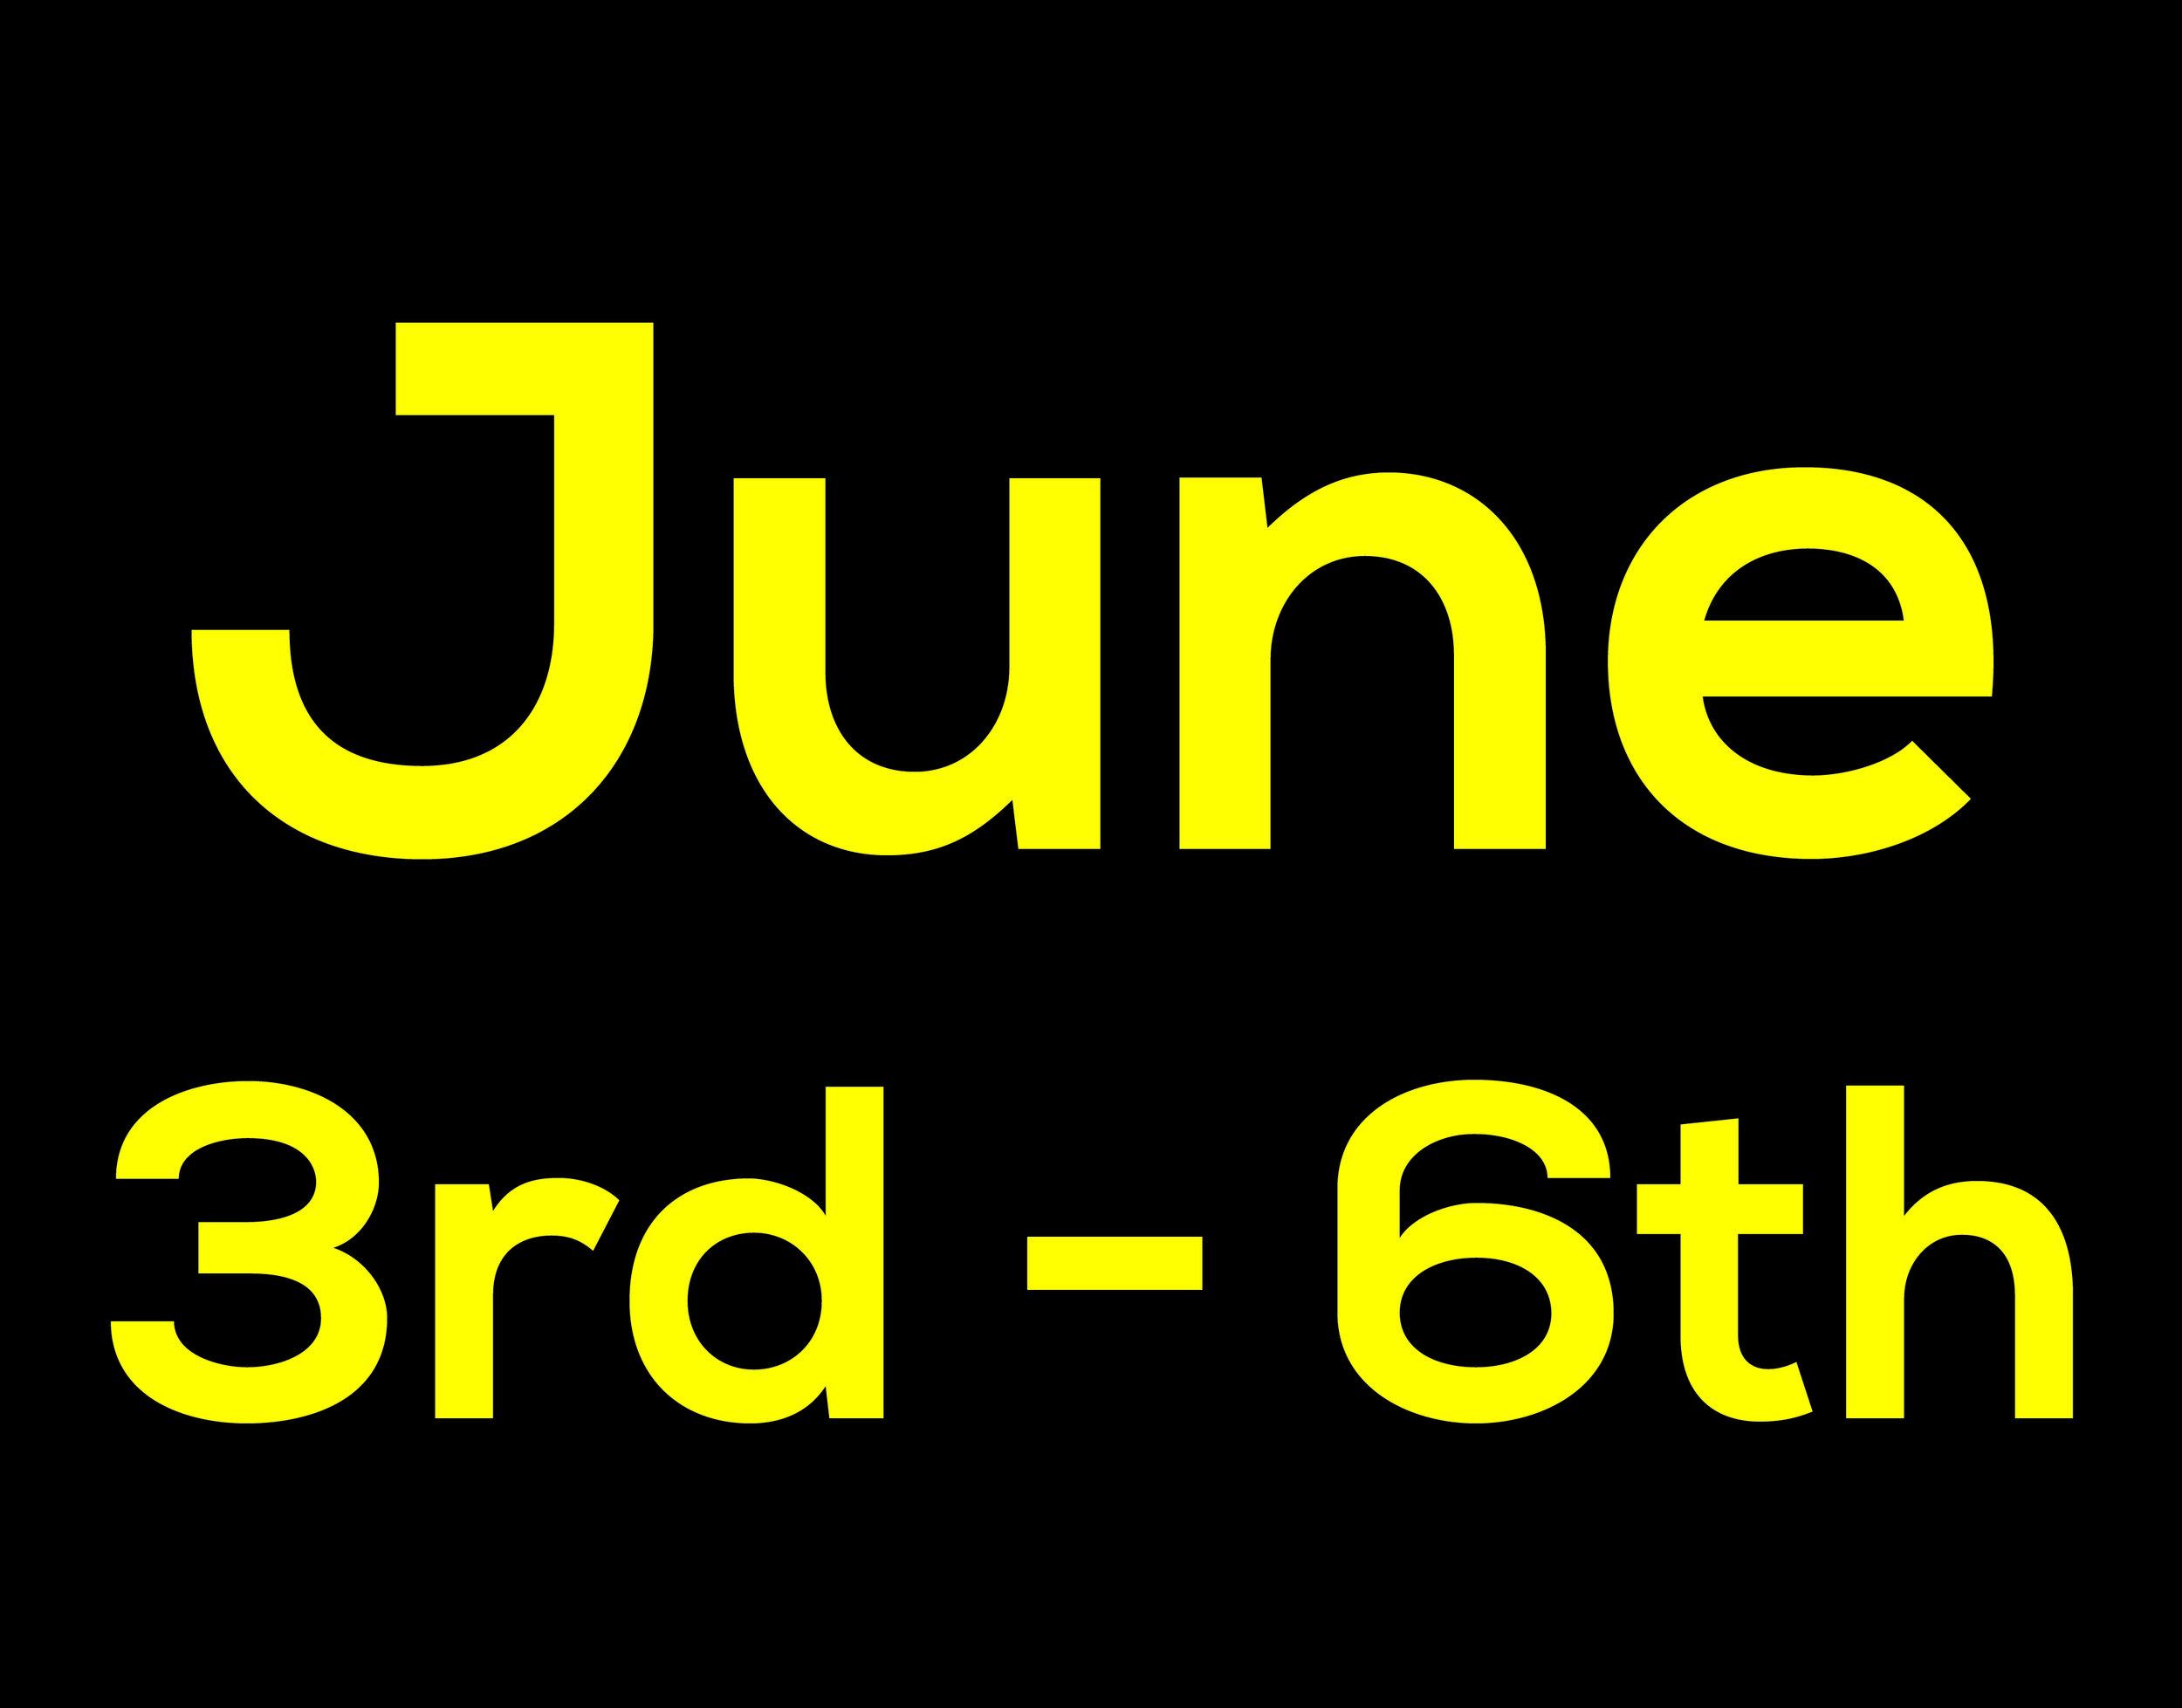 CM18 Yellow dates-01.jpg